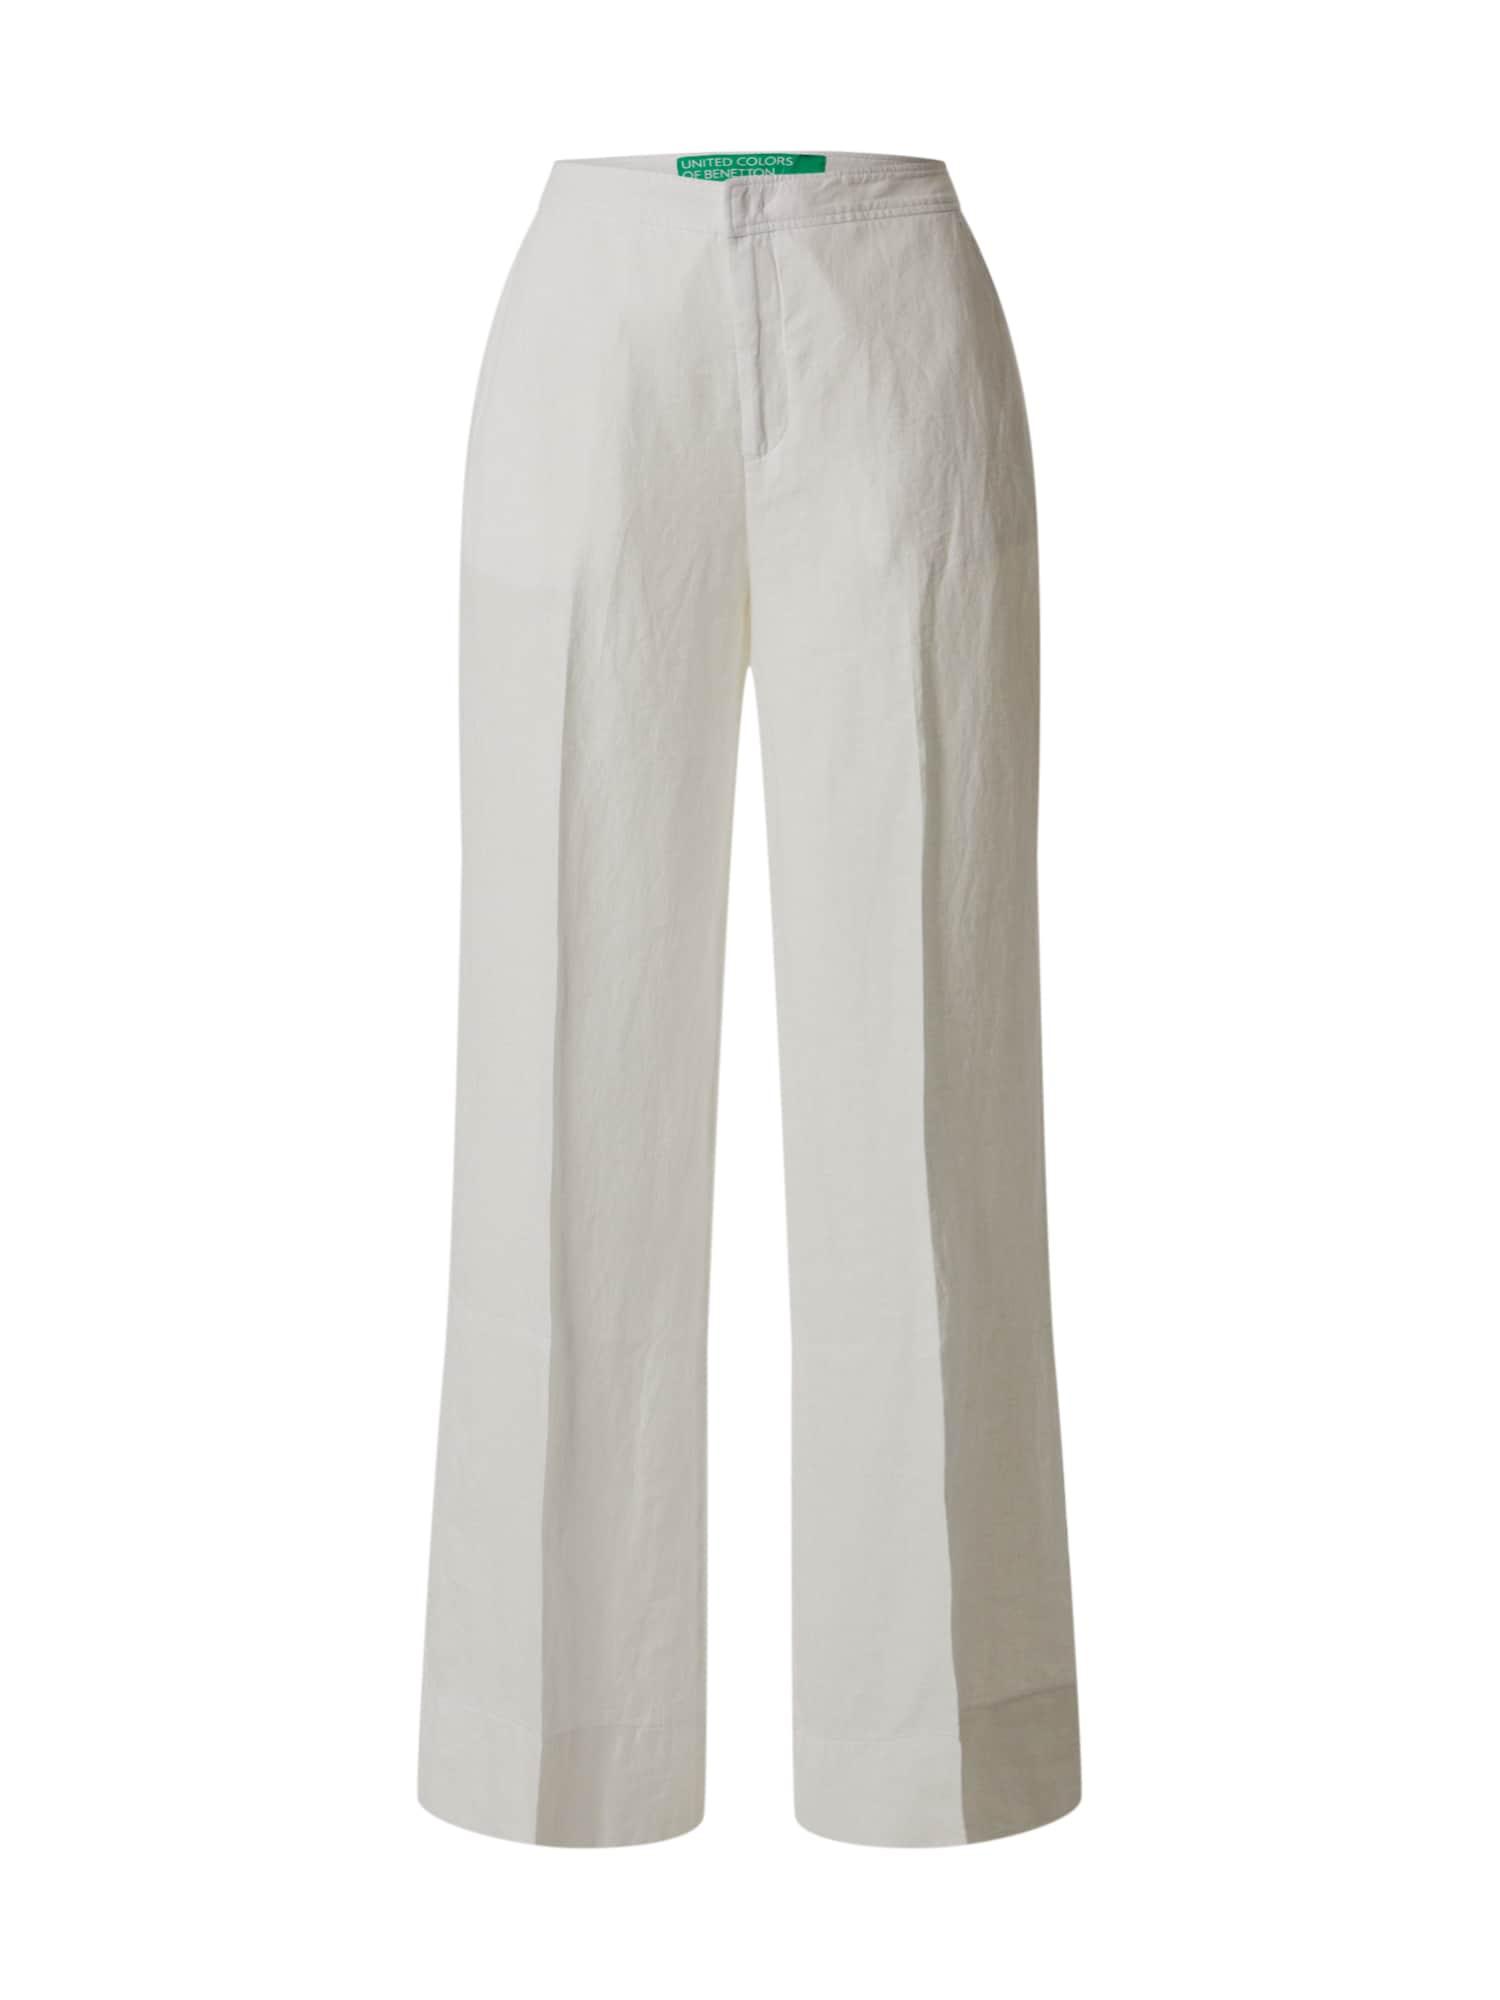 UNITED COLORS OF BENETTON Kelnės su kantu balta